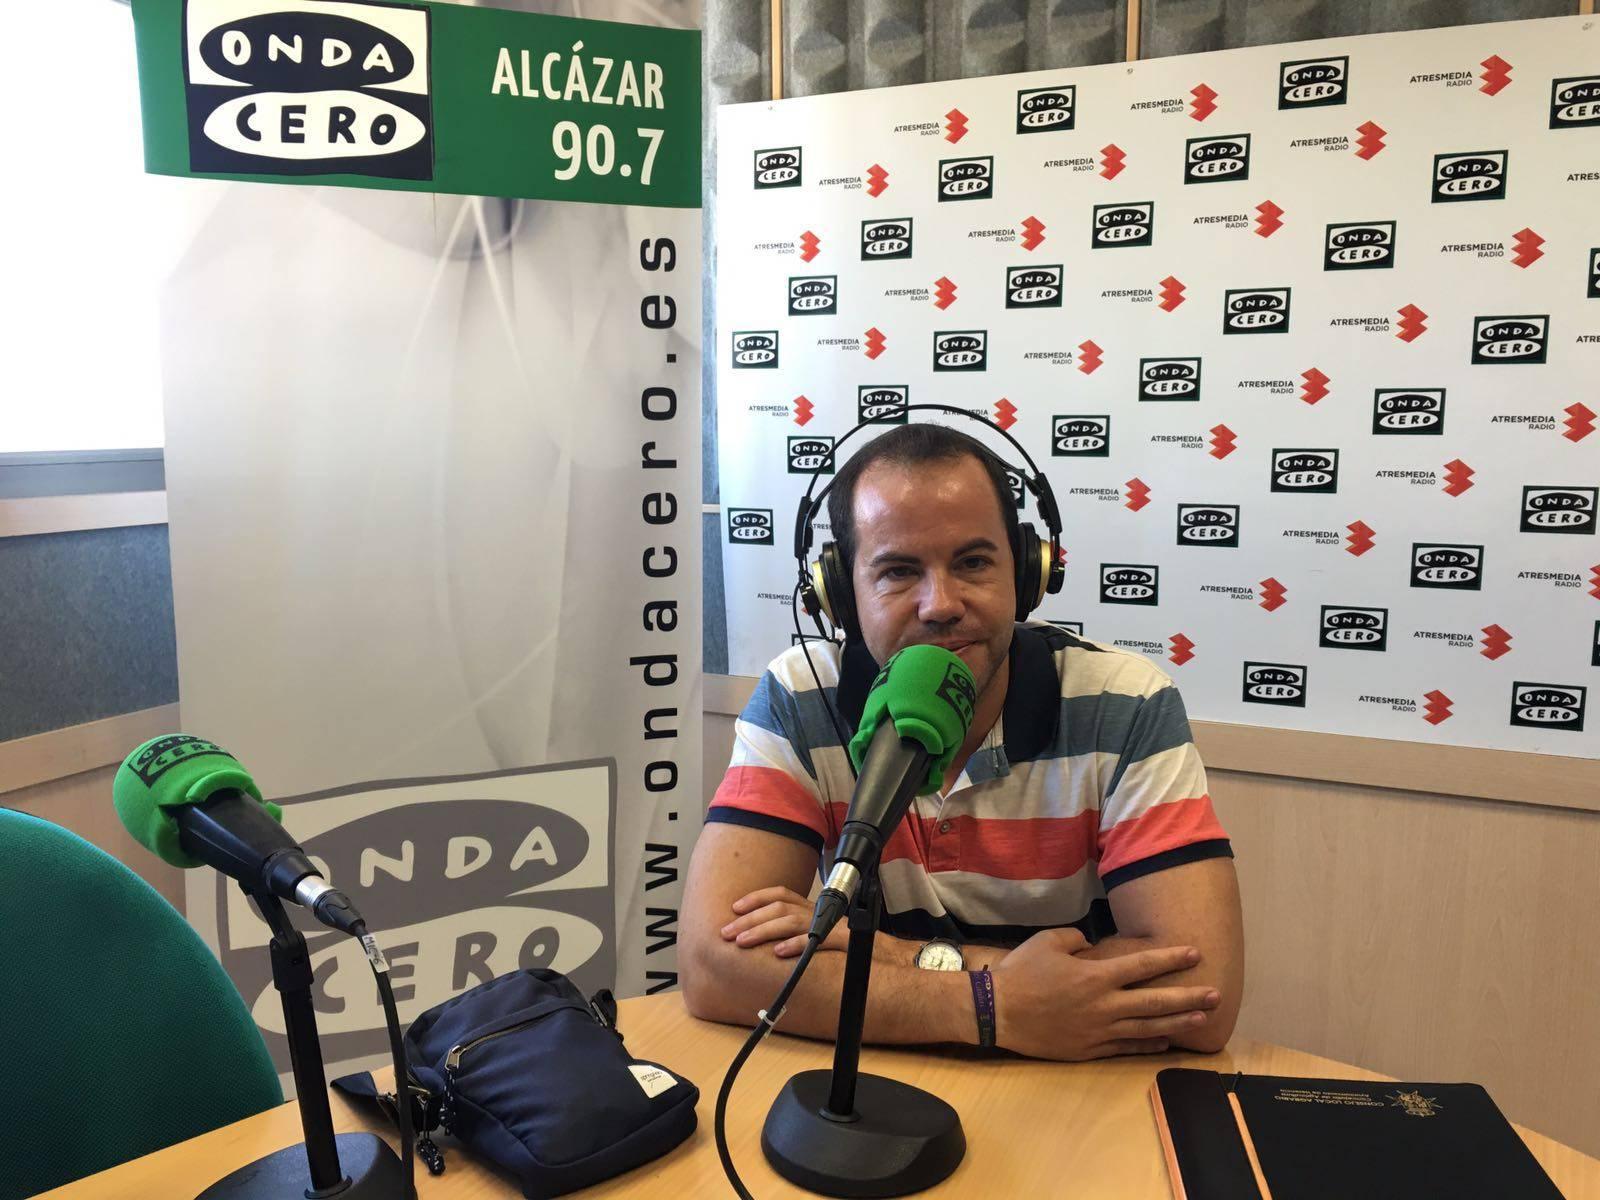 alcalde de herencia en onda cero - Alcalde de Herencia en Onda Cero La Mancha